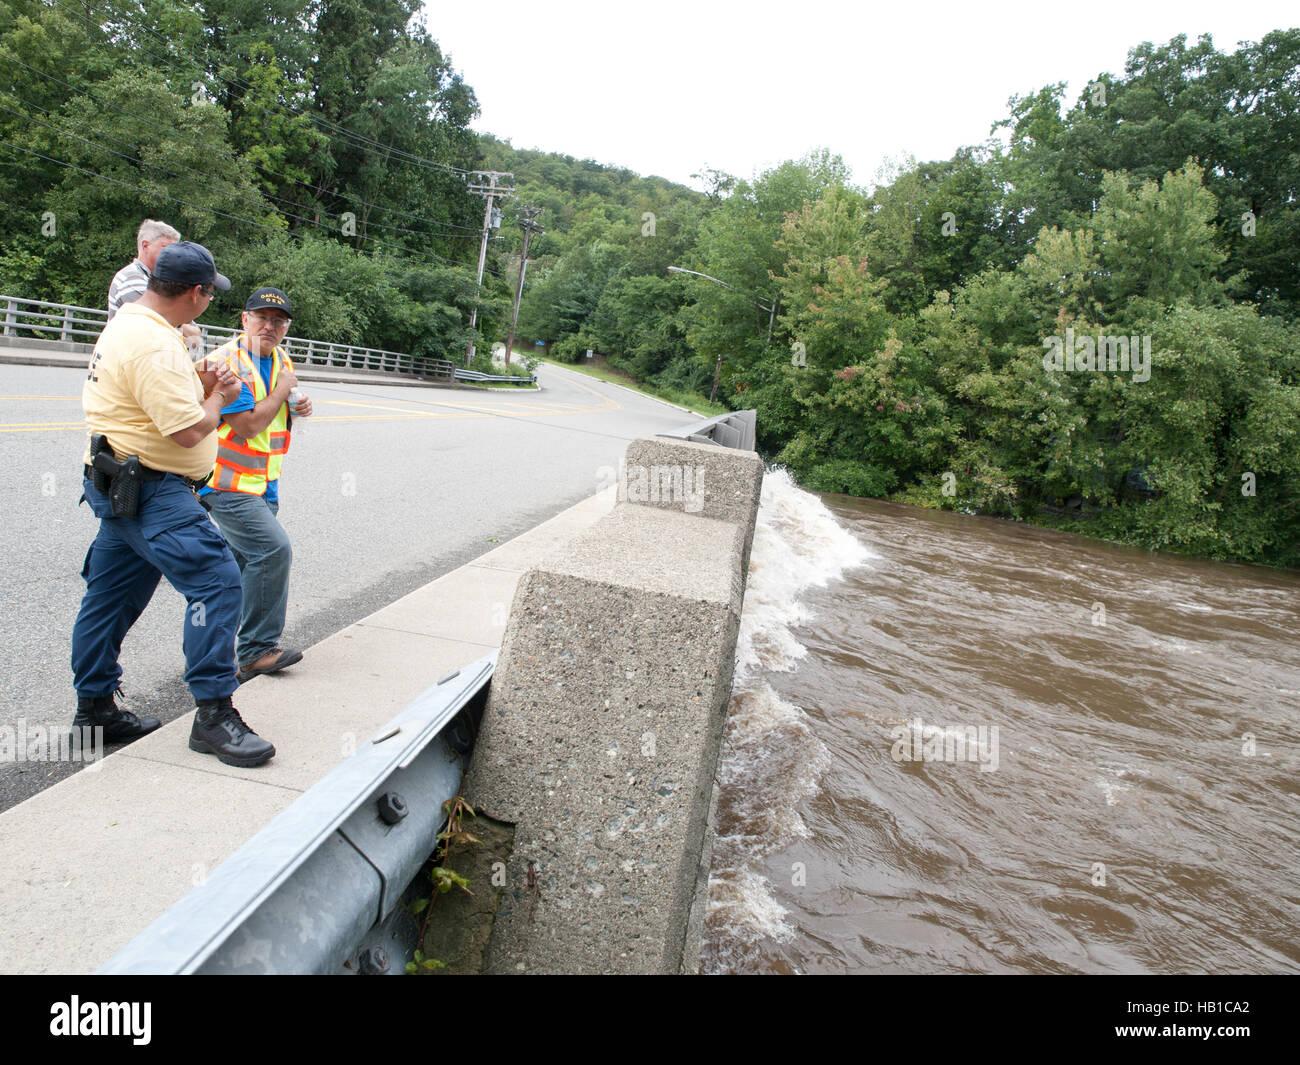 Flooding Hurricane Irene - Stock Image